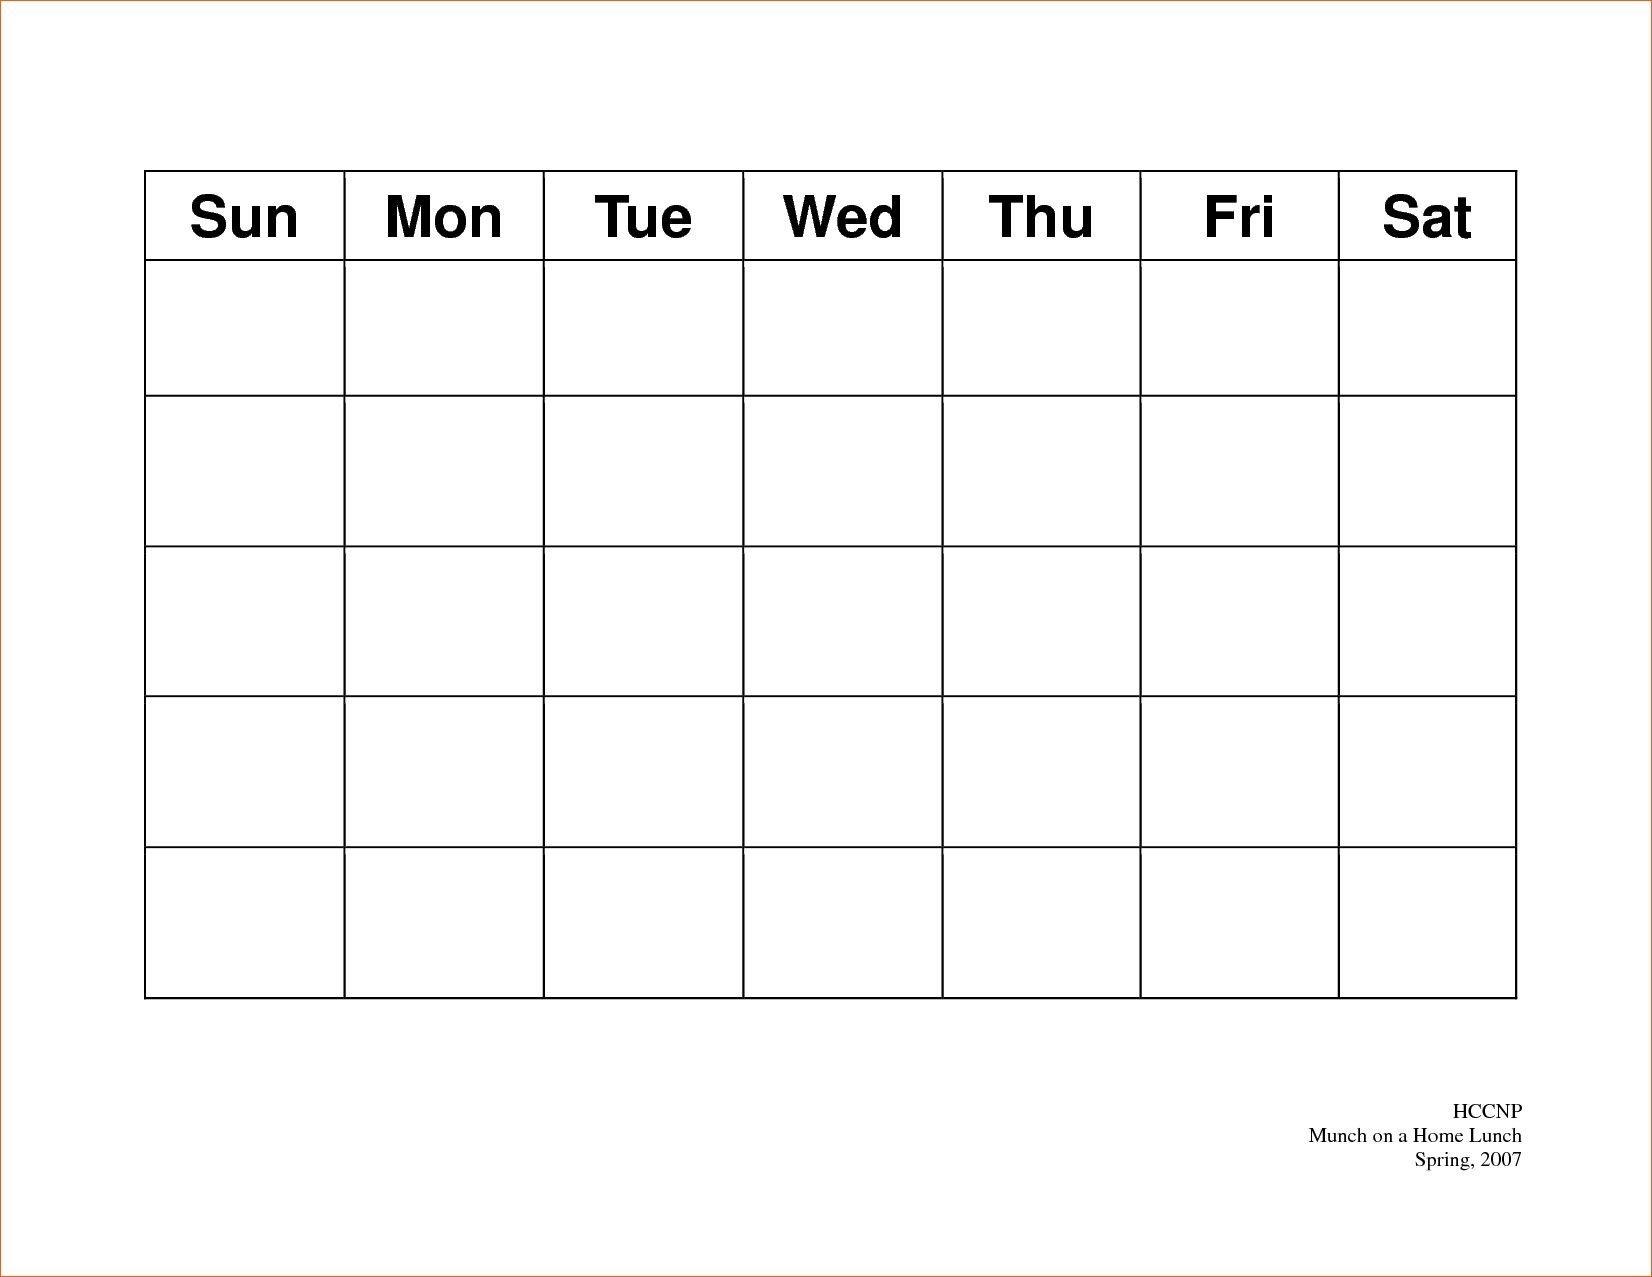 Calendar 5 Day Weekly Calendar Template On 5 Week Calendar Printable Calendar For Every 2 Weeks